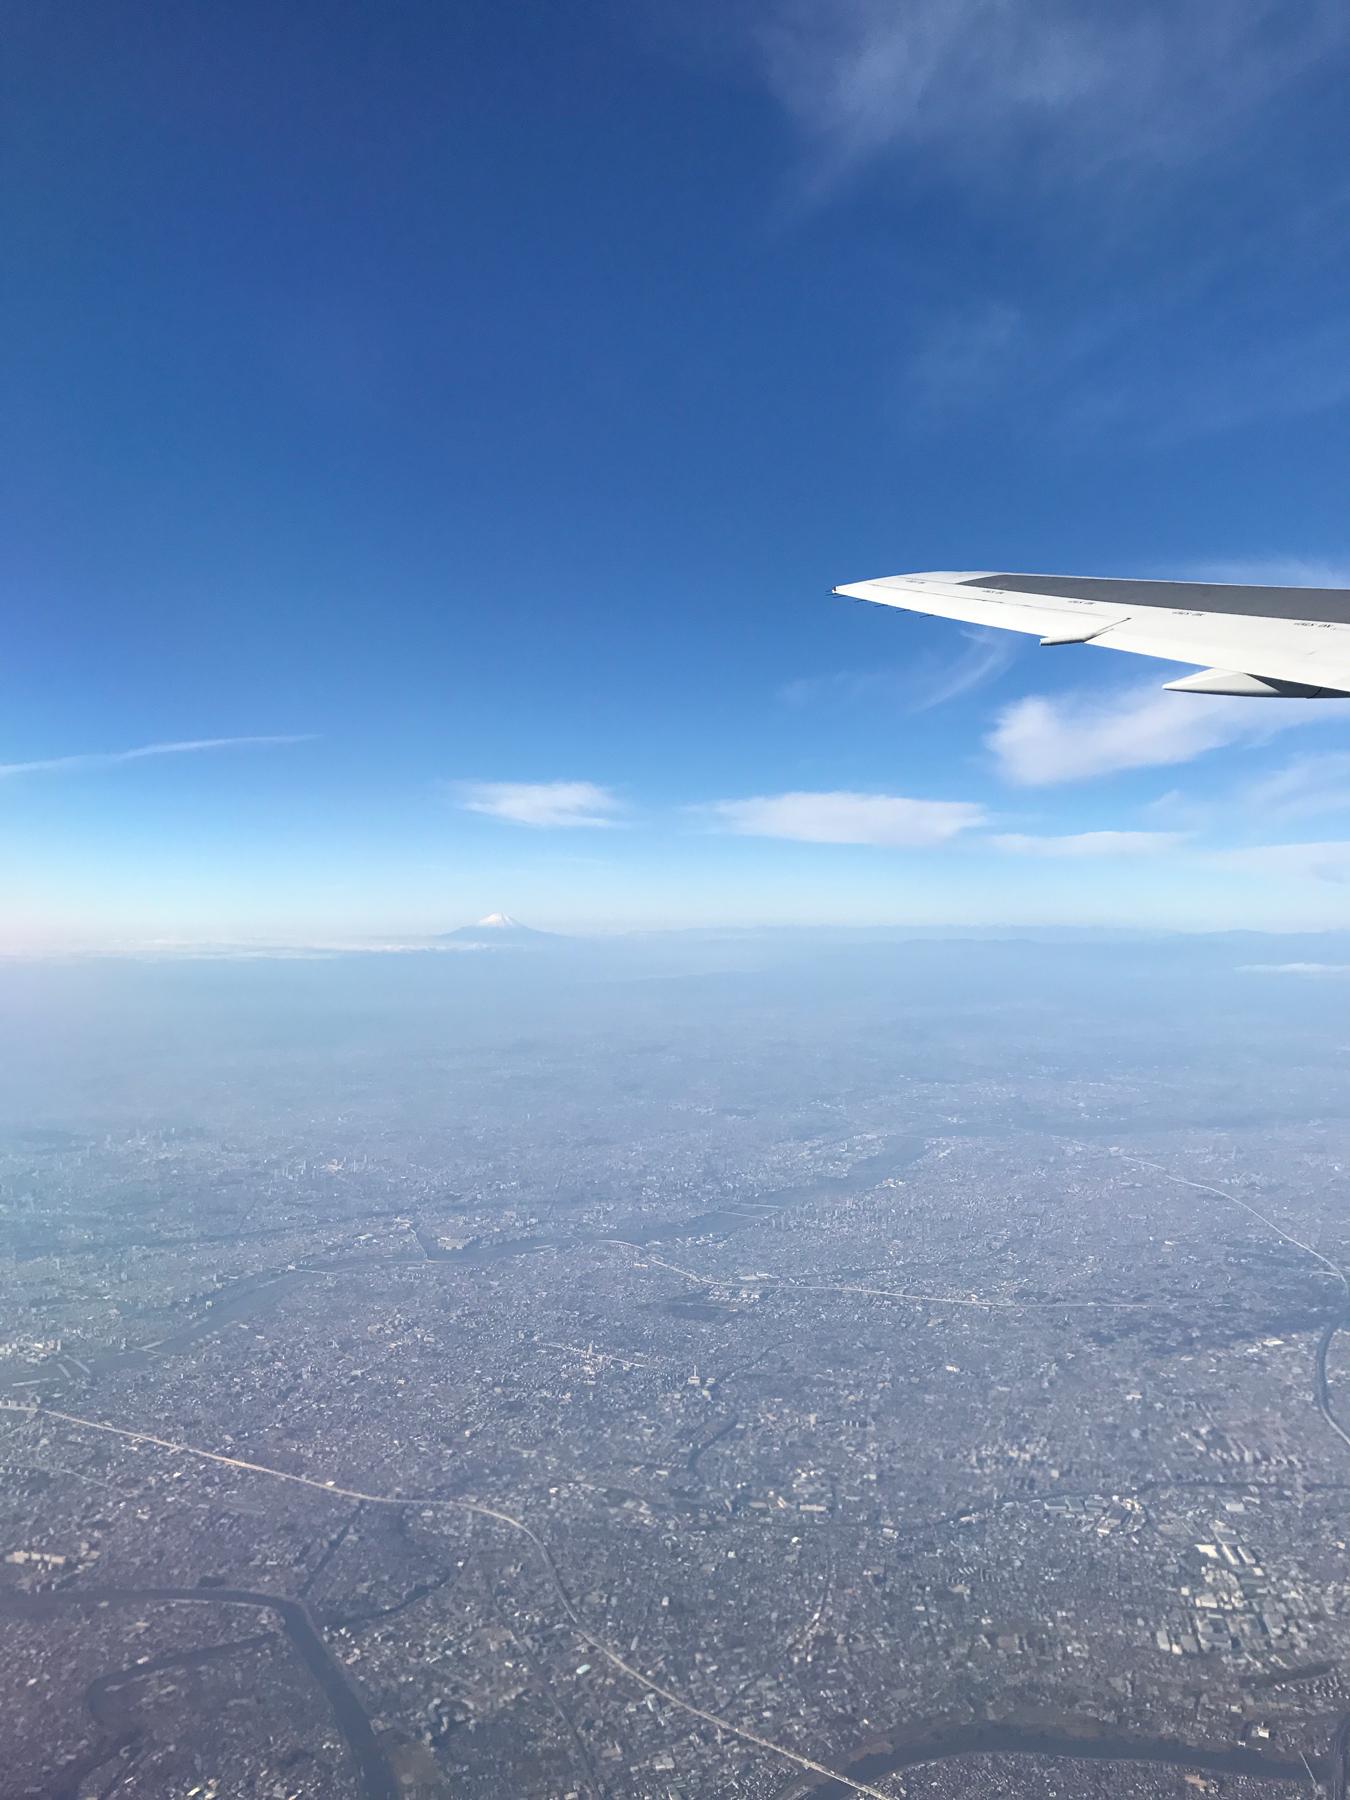 Haneda to Shin-Chitose air port! Can you spot Mt. Fuji?